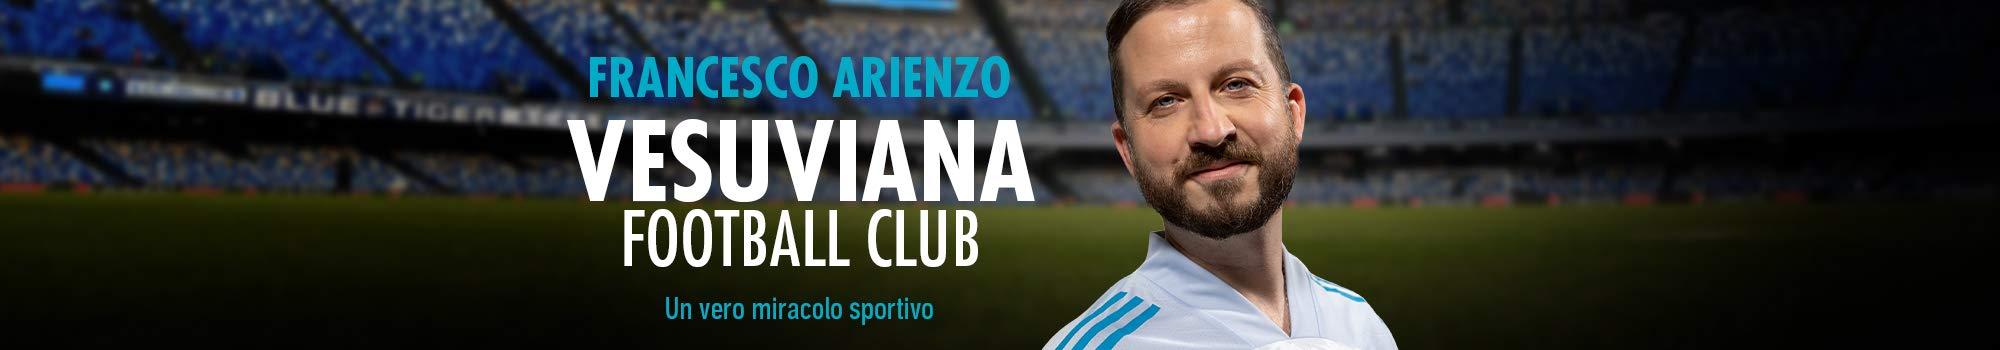 Vesuviana football club